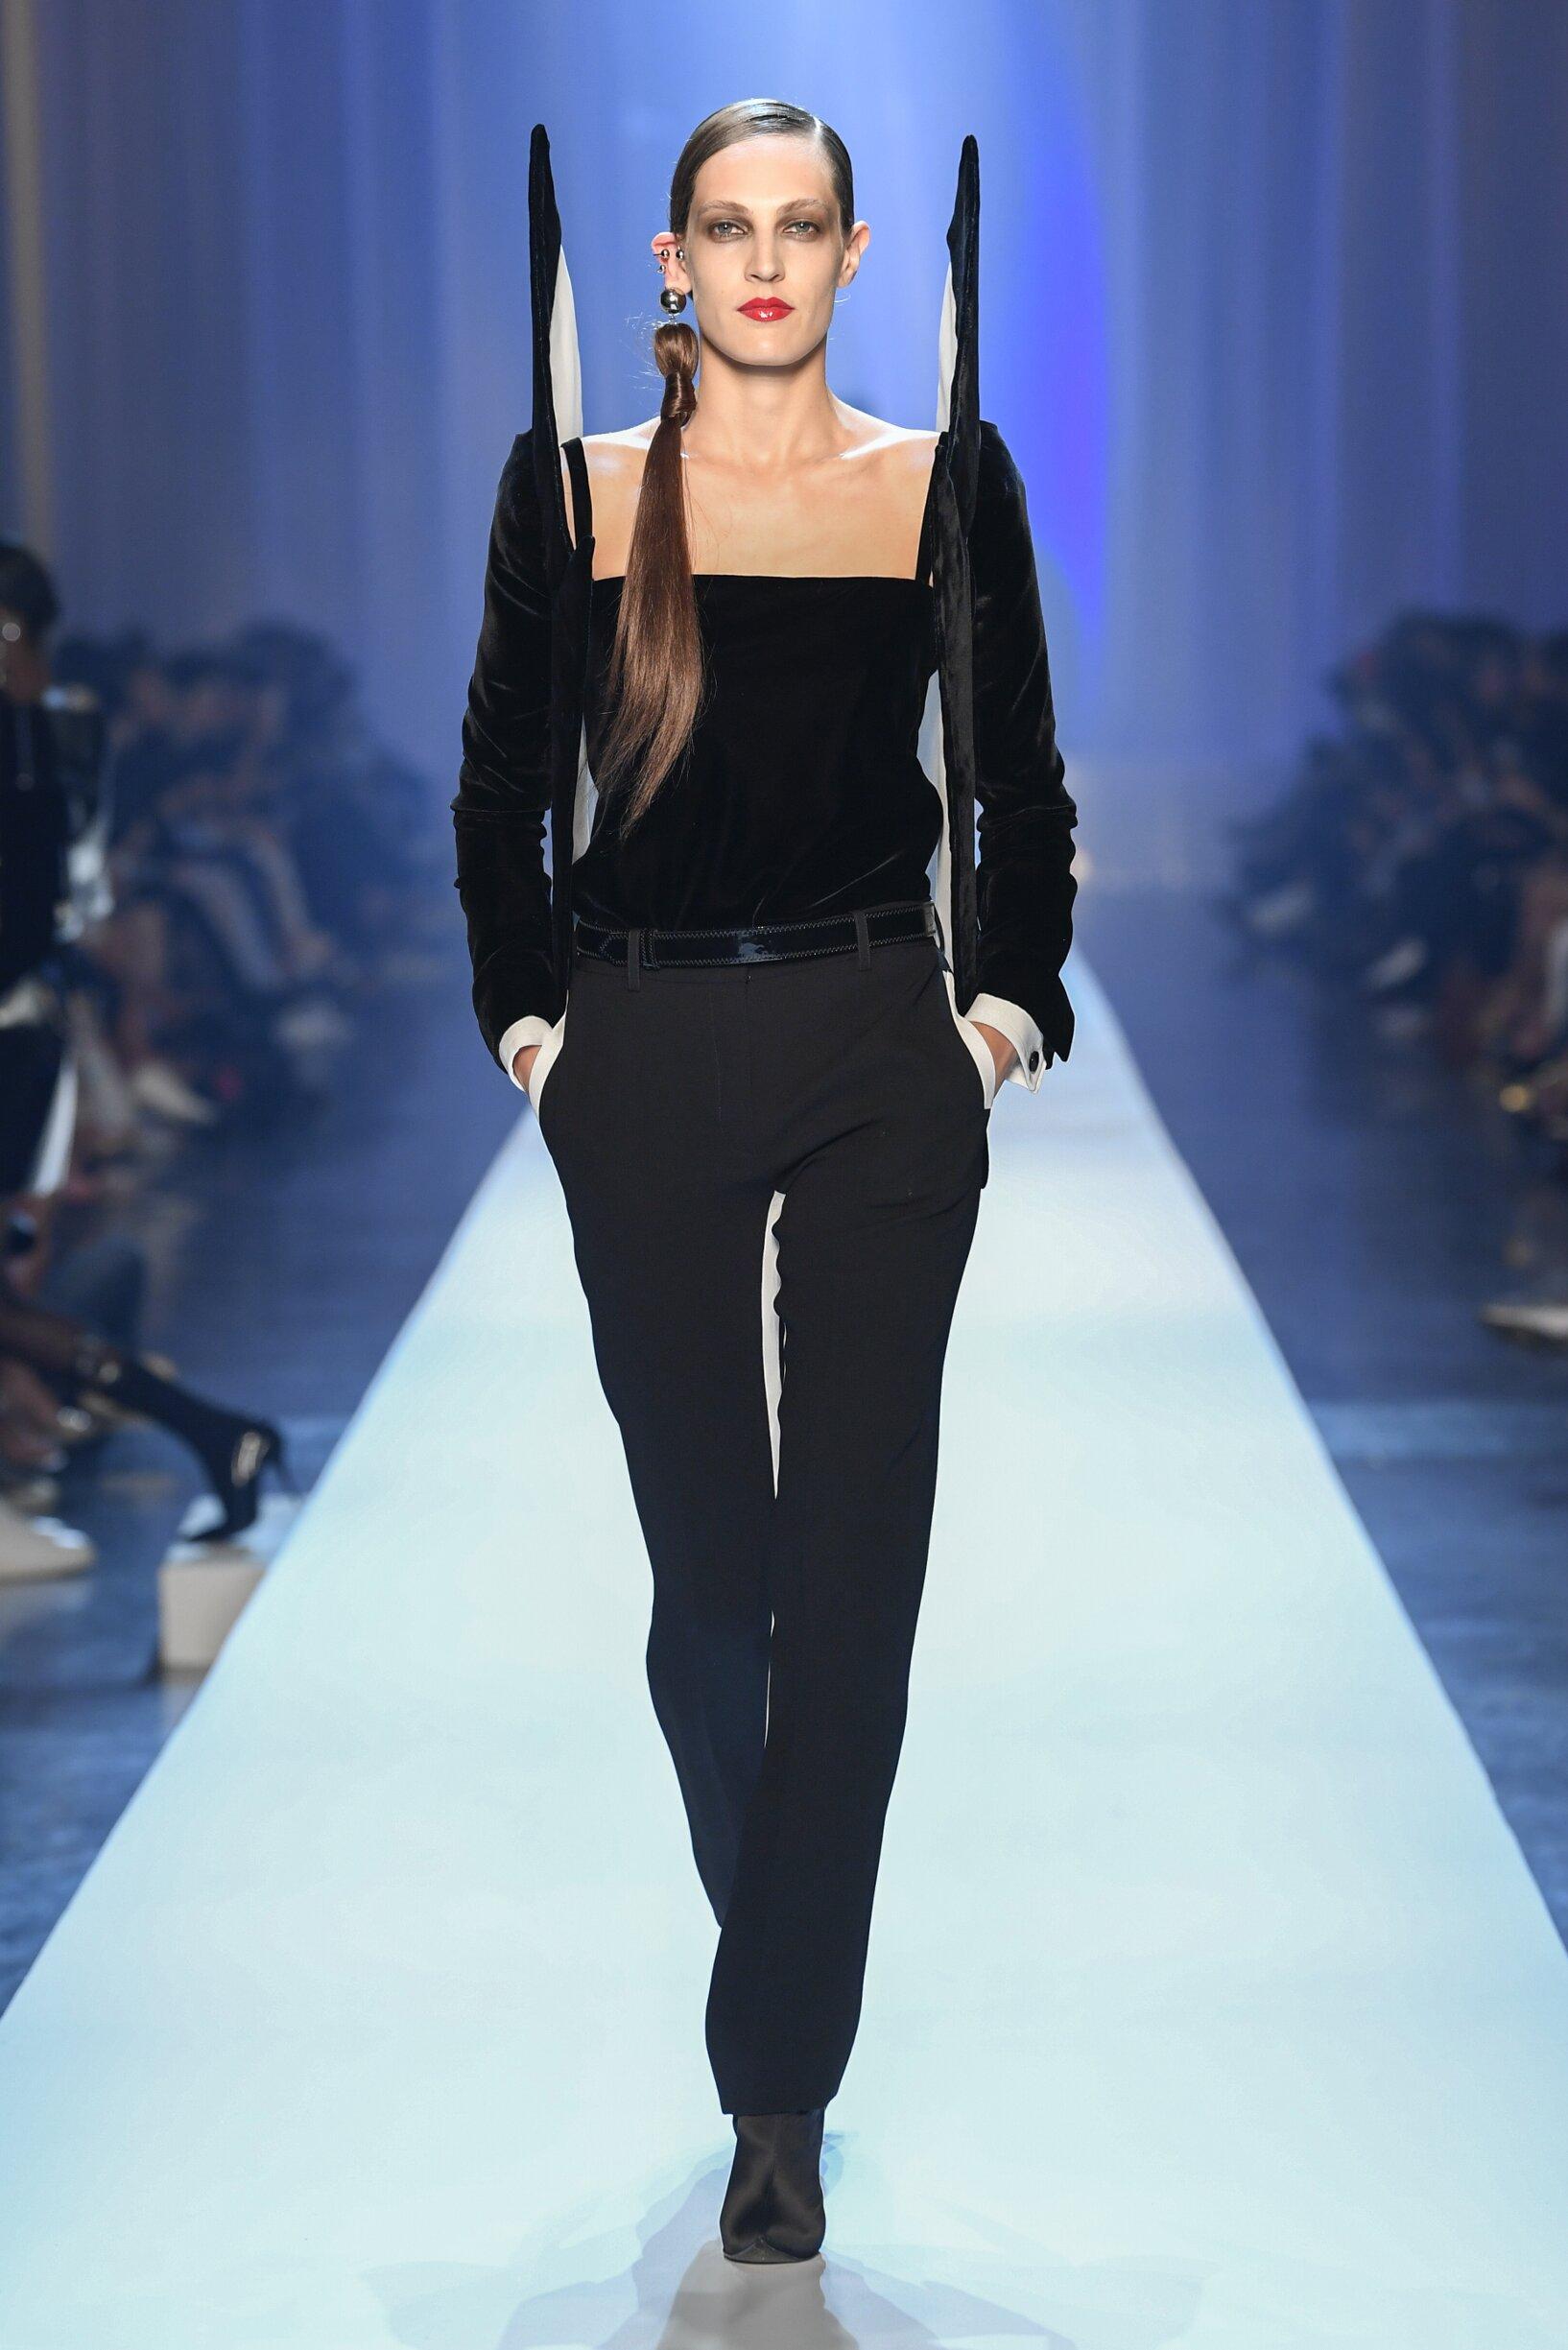 Fashion Week 2018 Catwalk Jean-Paul Gaultier Haute Couture